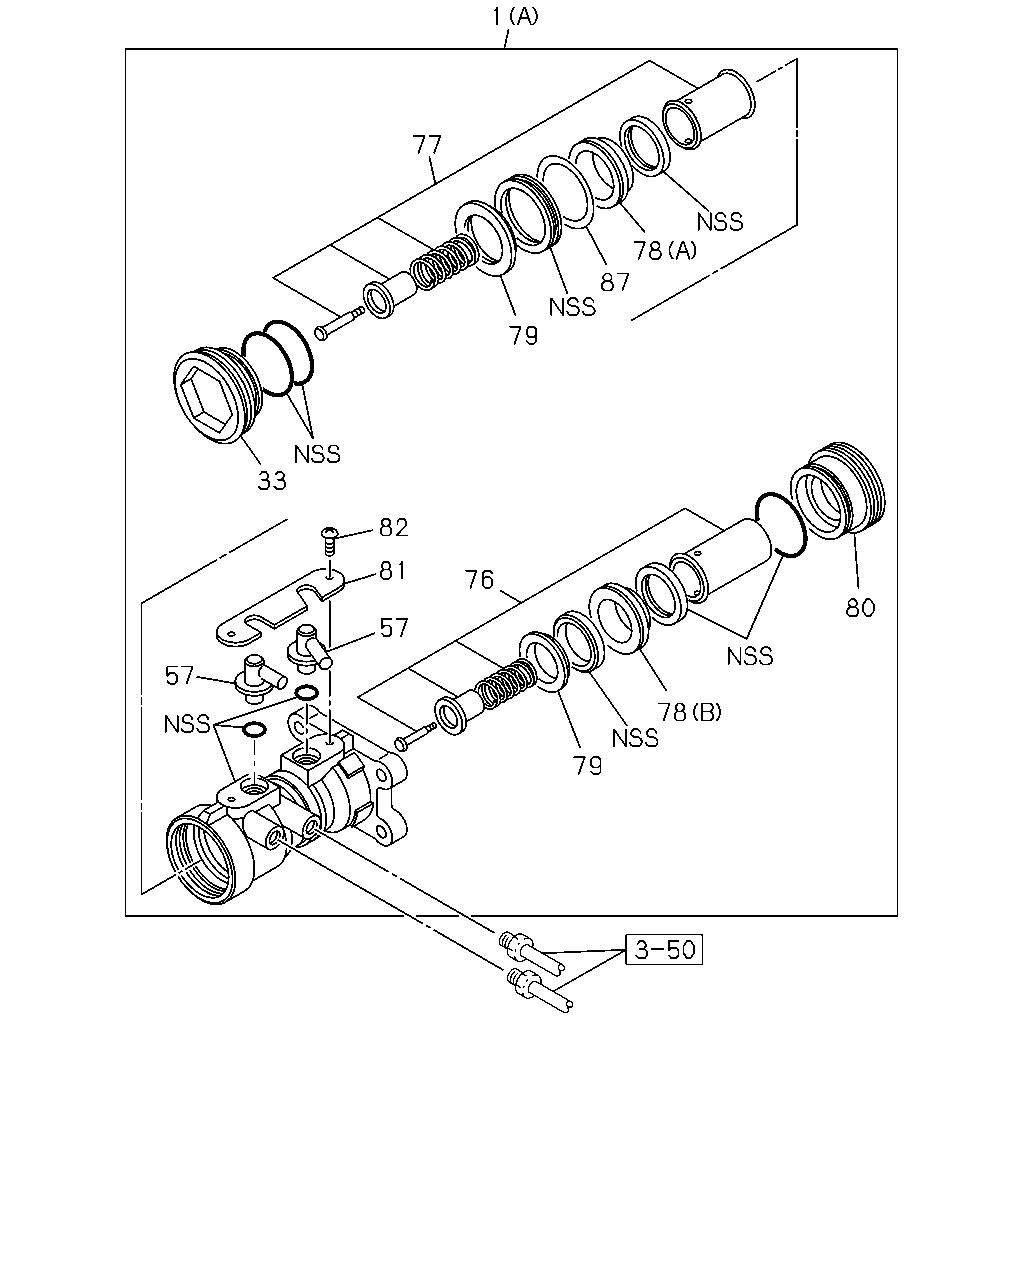 Isuzu kes Diagram - Technical Diagrams on